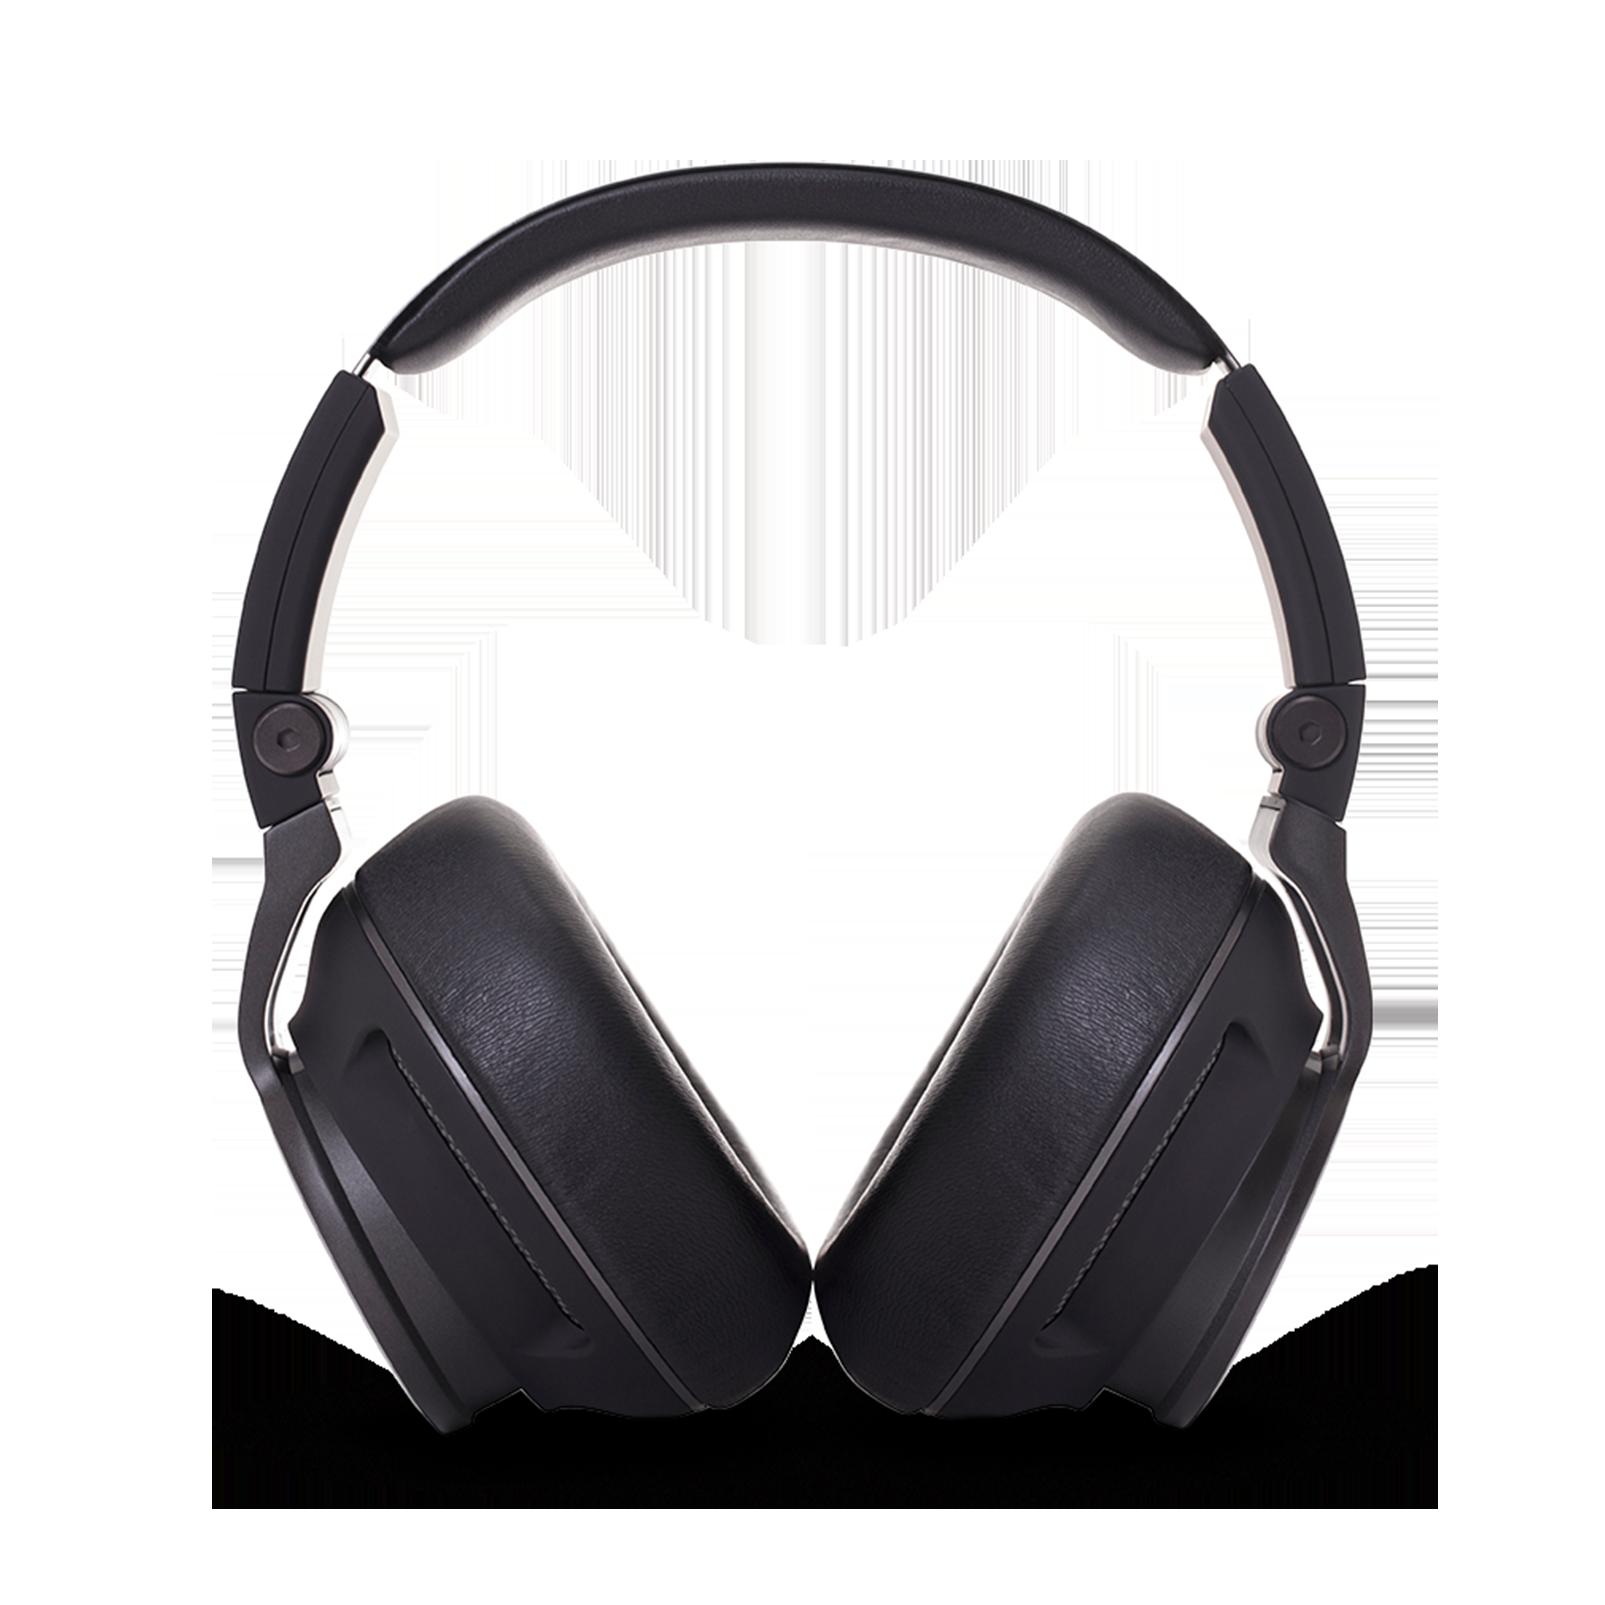 Headphones Jbl Synchros E30 Page 3 Daftar Update Harga Terbaru Headset Home S500